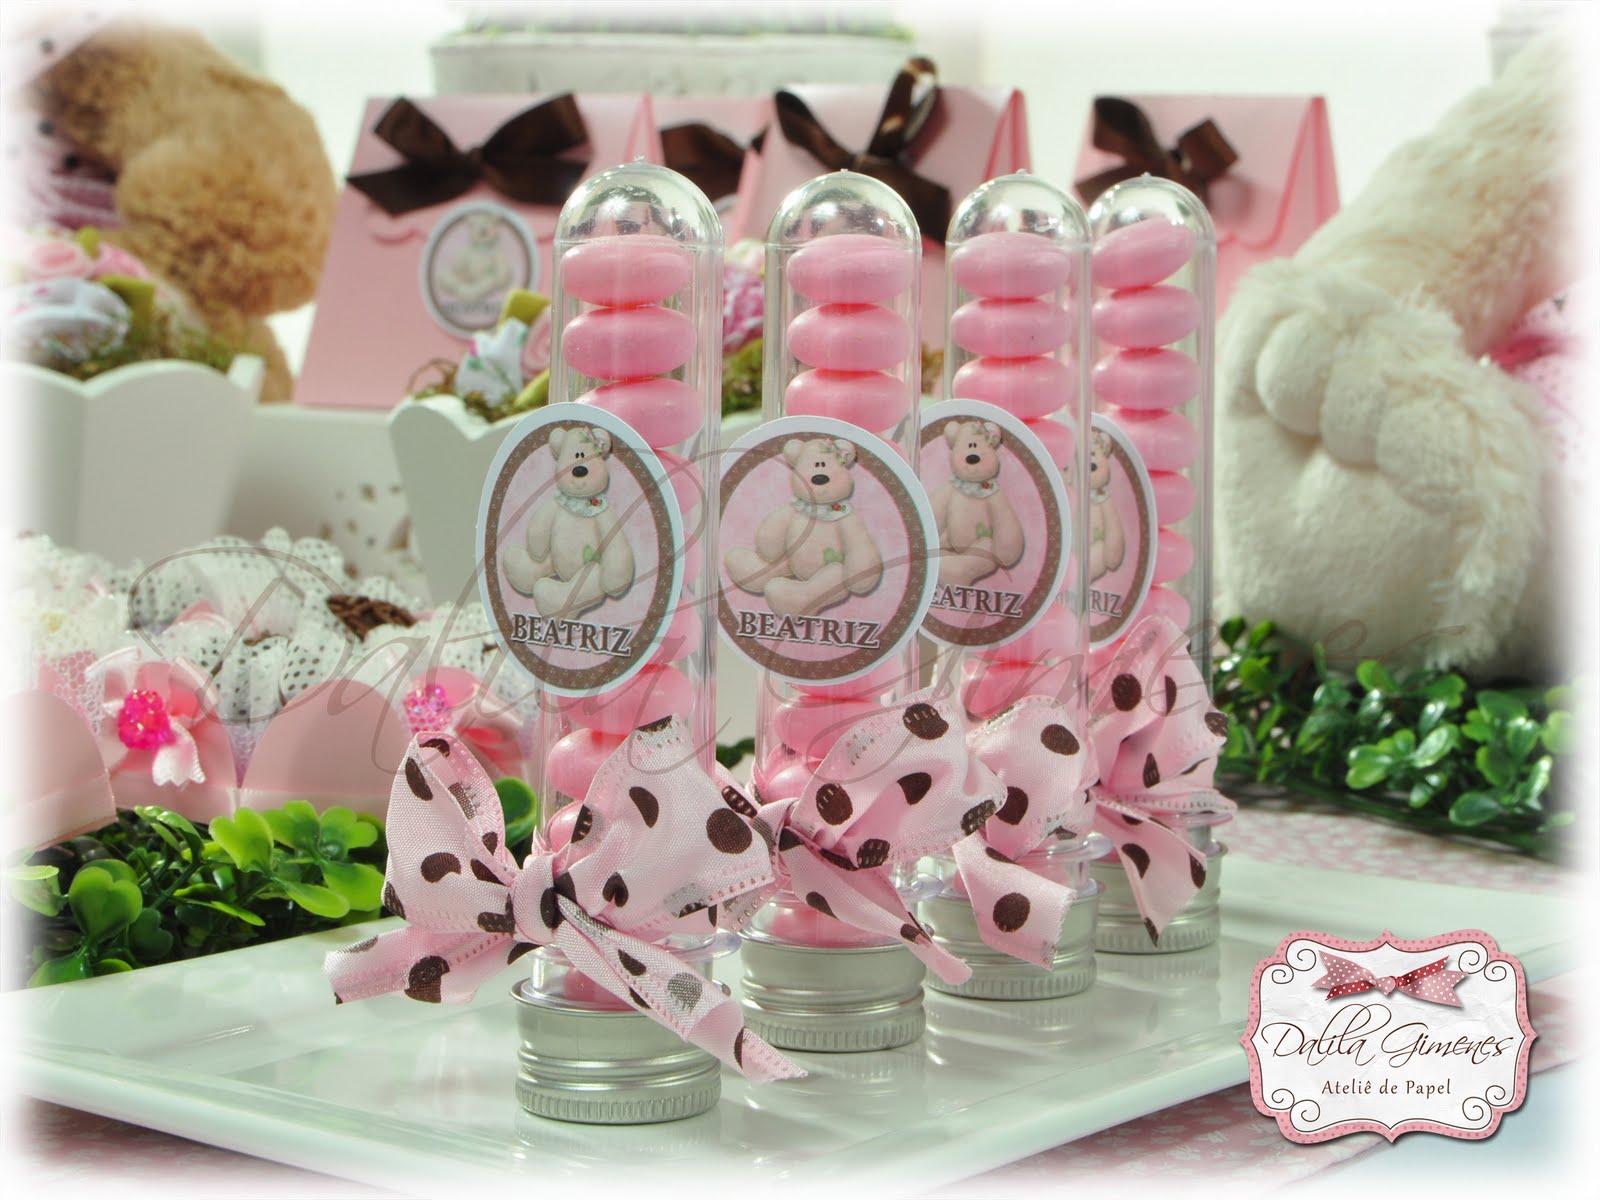 Pin 20 Convite Ursa Rosa E Marrom Floral R $ 7 46 Provencal on